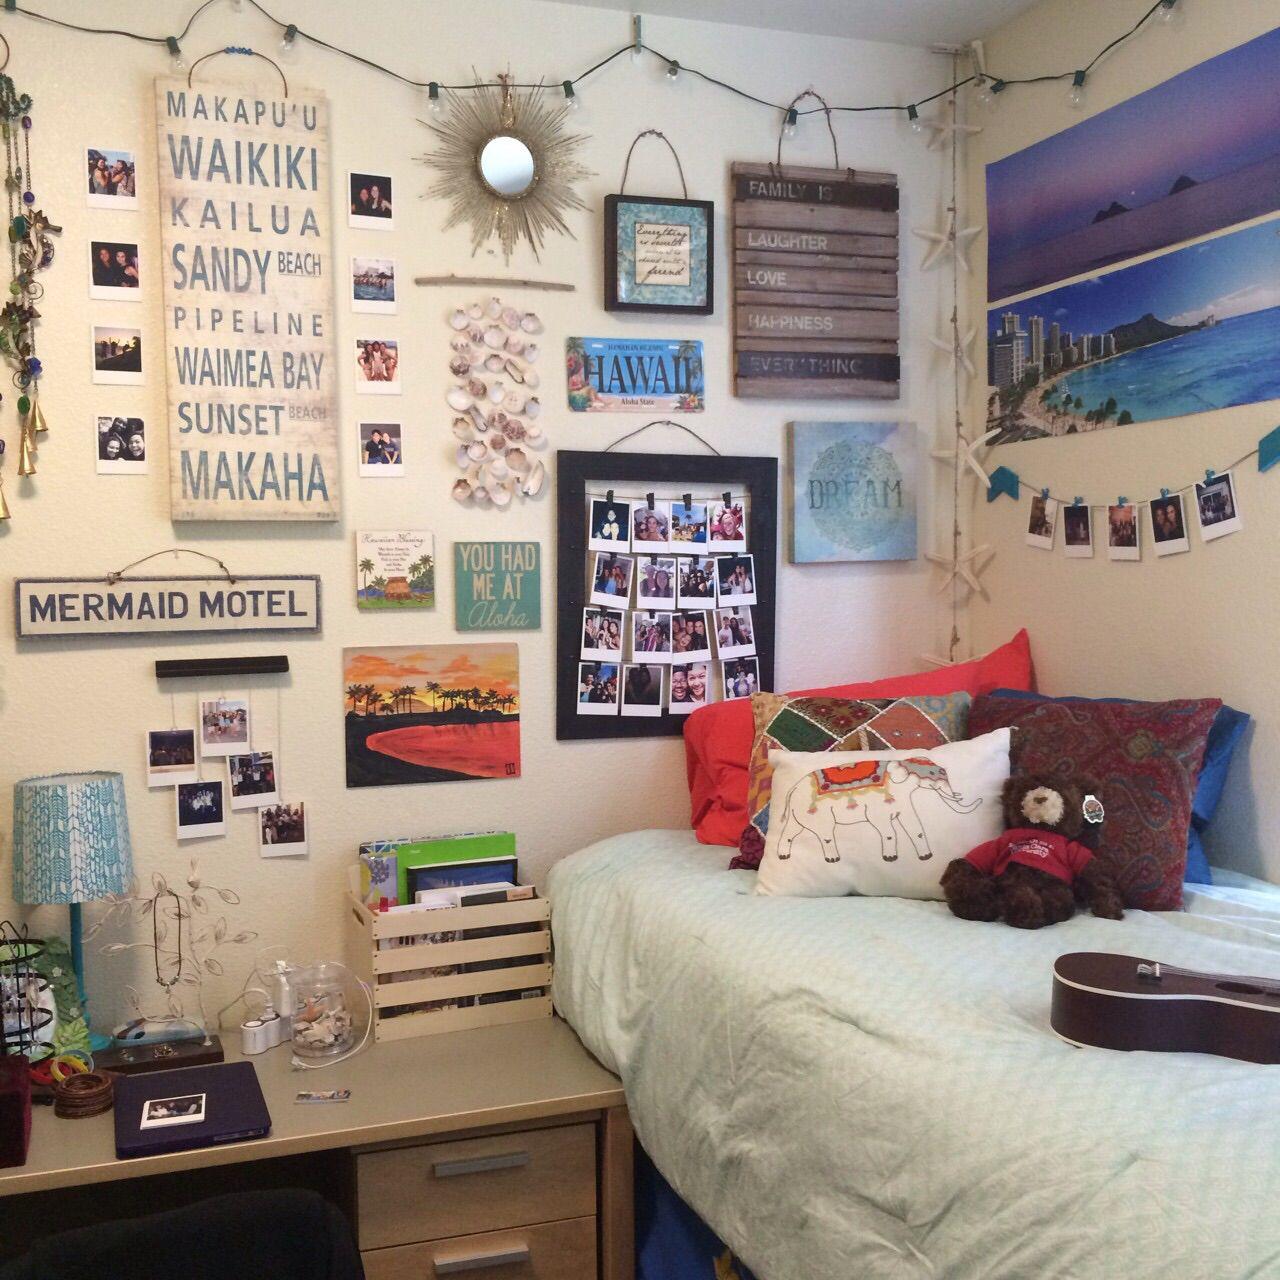 Pin By Mehak Saini On University Cool Dorm Rooms Cozy Dorm Room